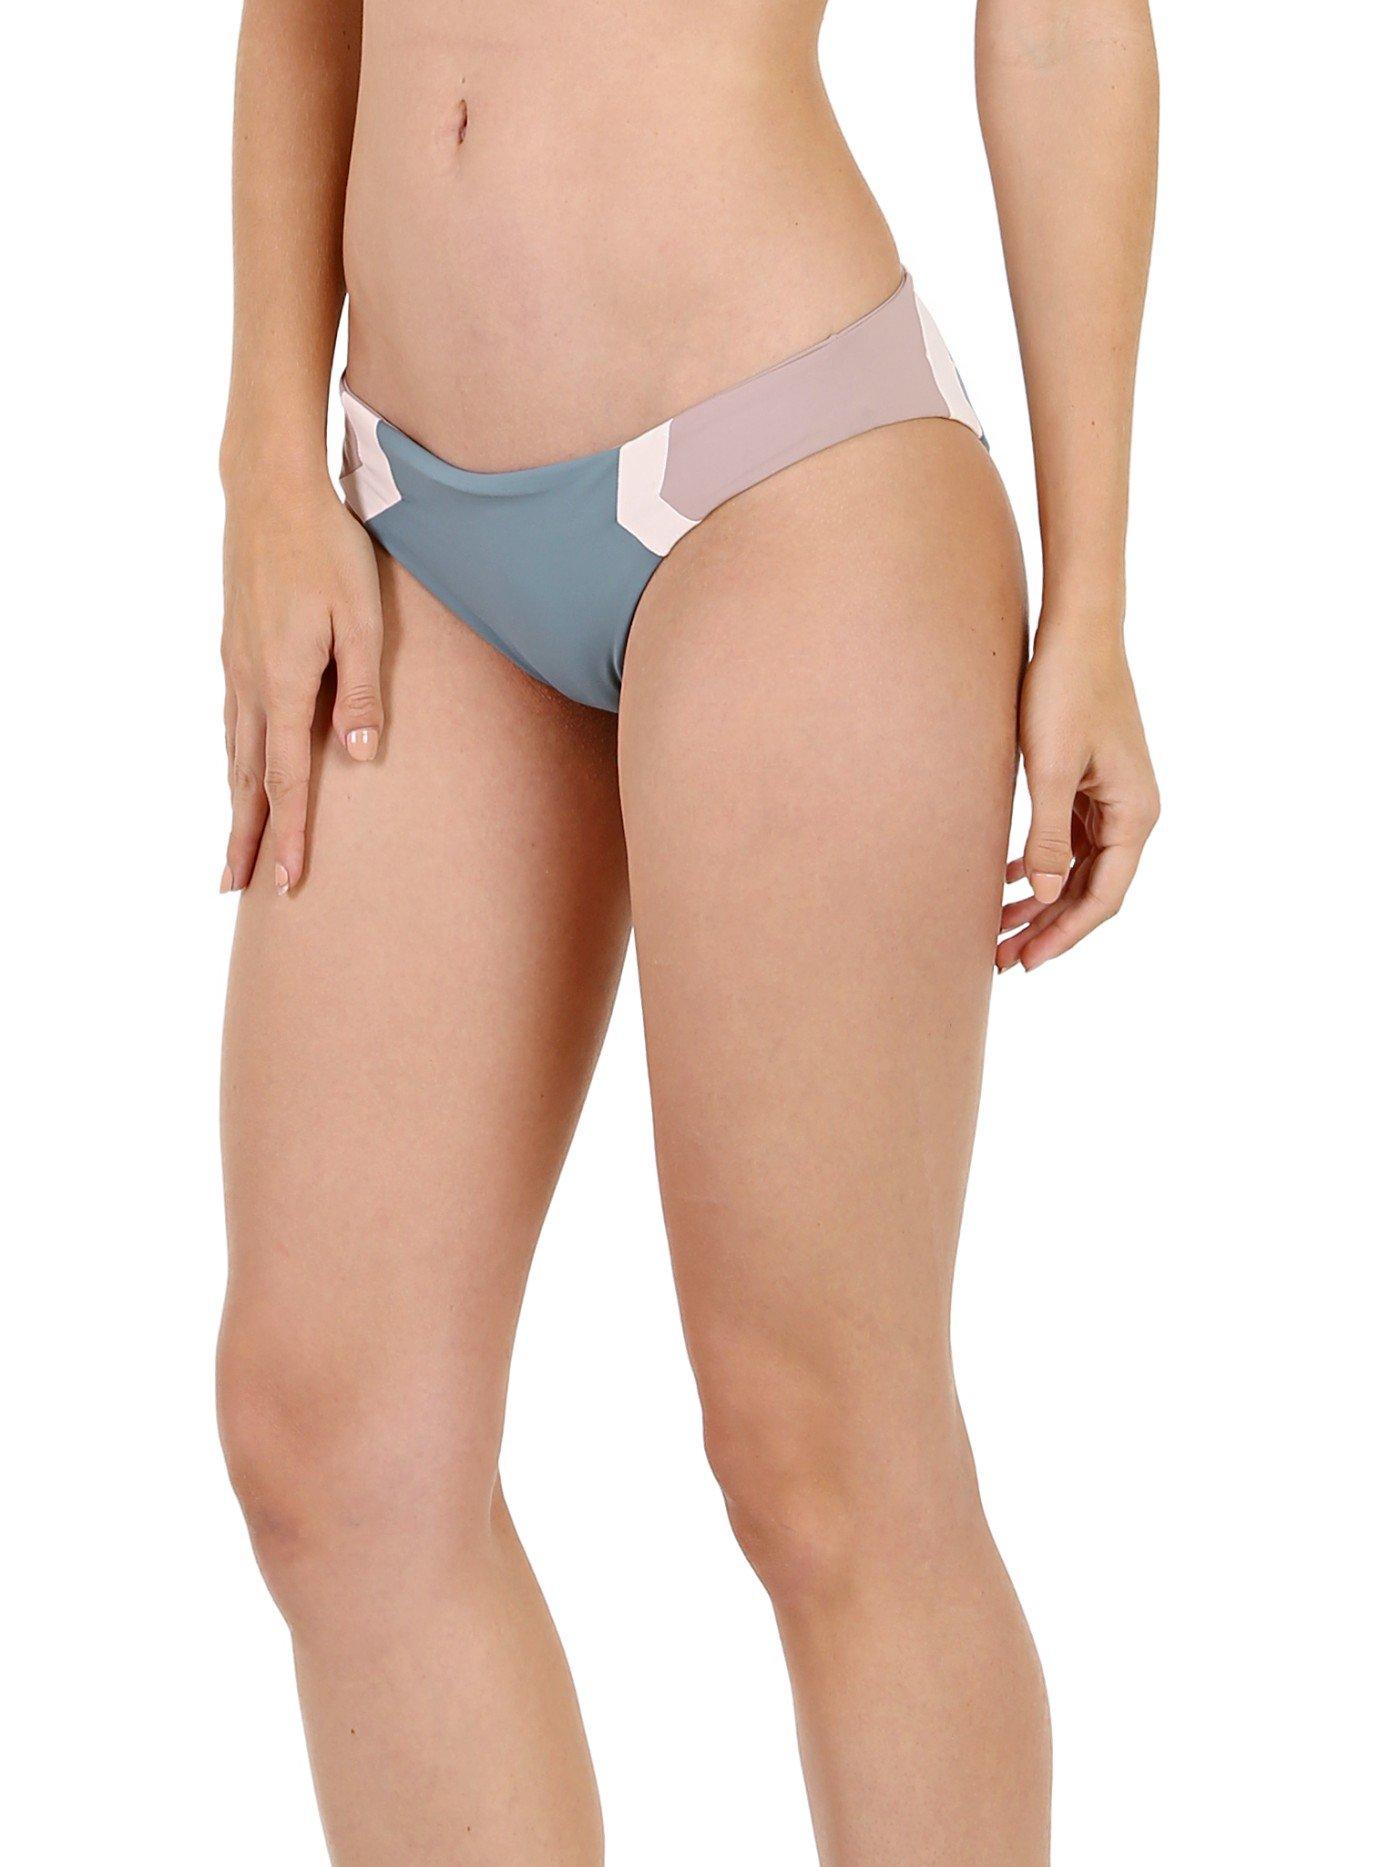 LSpace Women's Color Block Reversible Hipster Bikini Bottom Slated Glass L